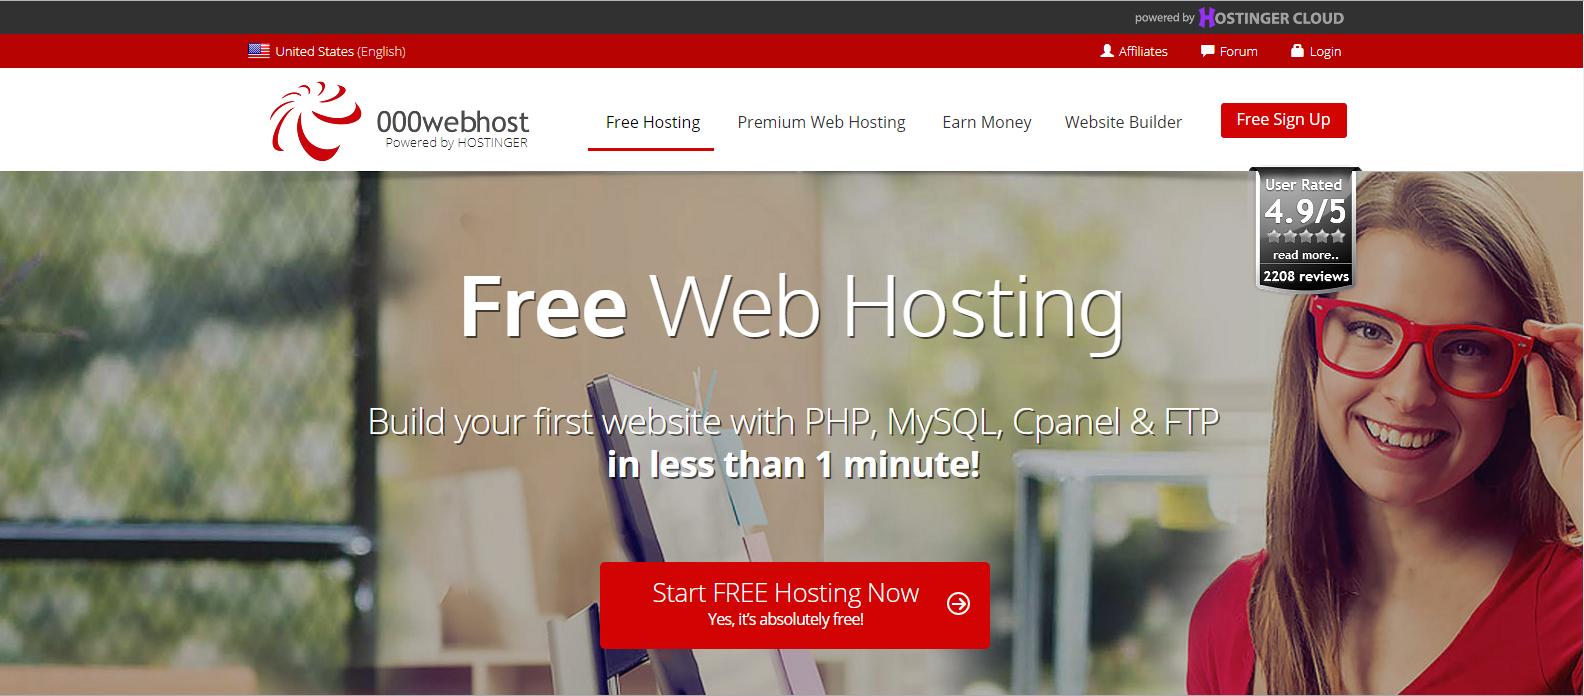 Hosting Gratis - 000webhost